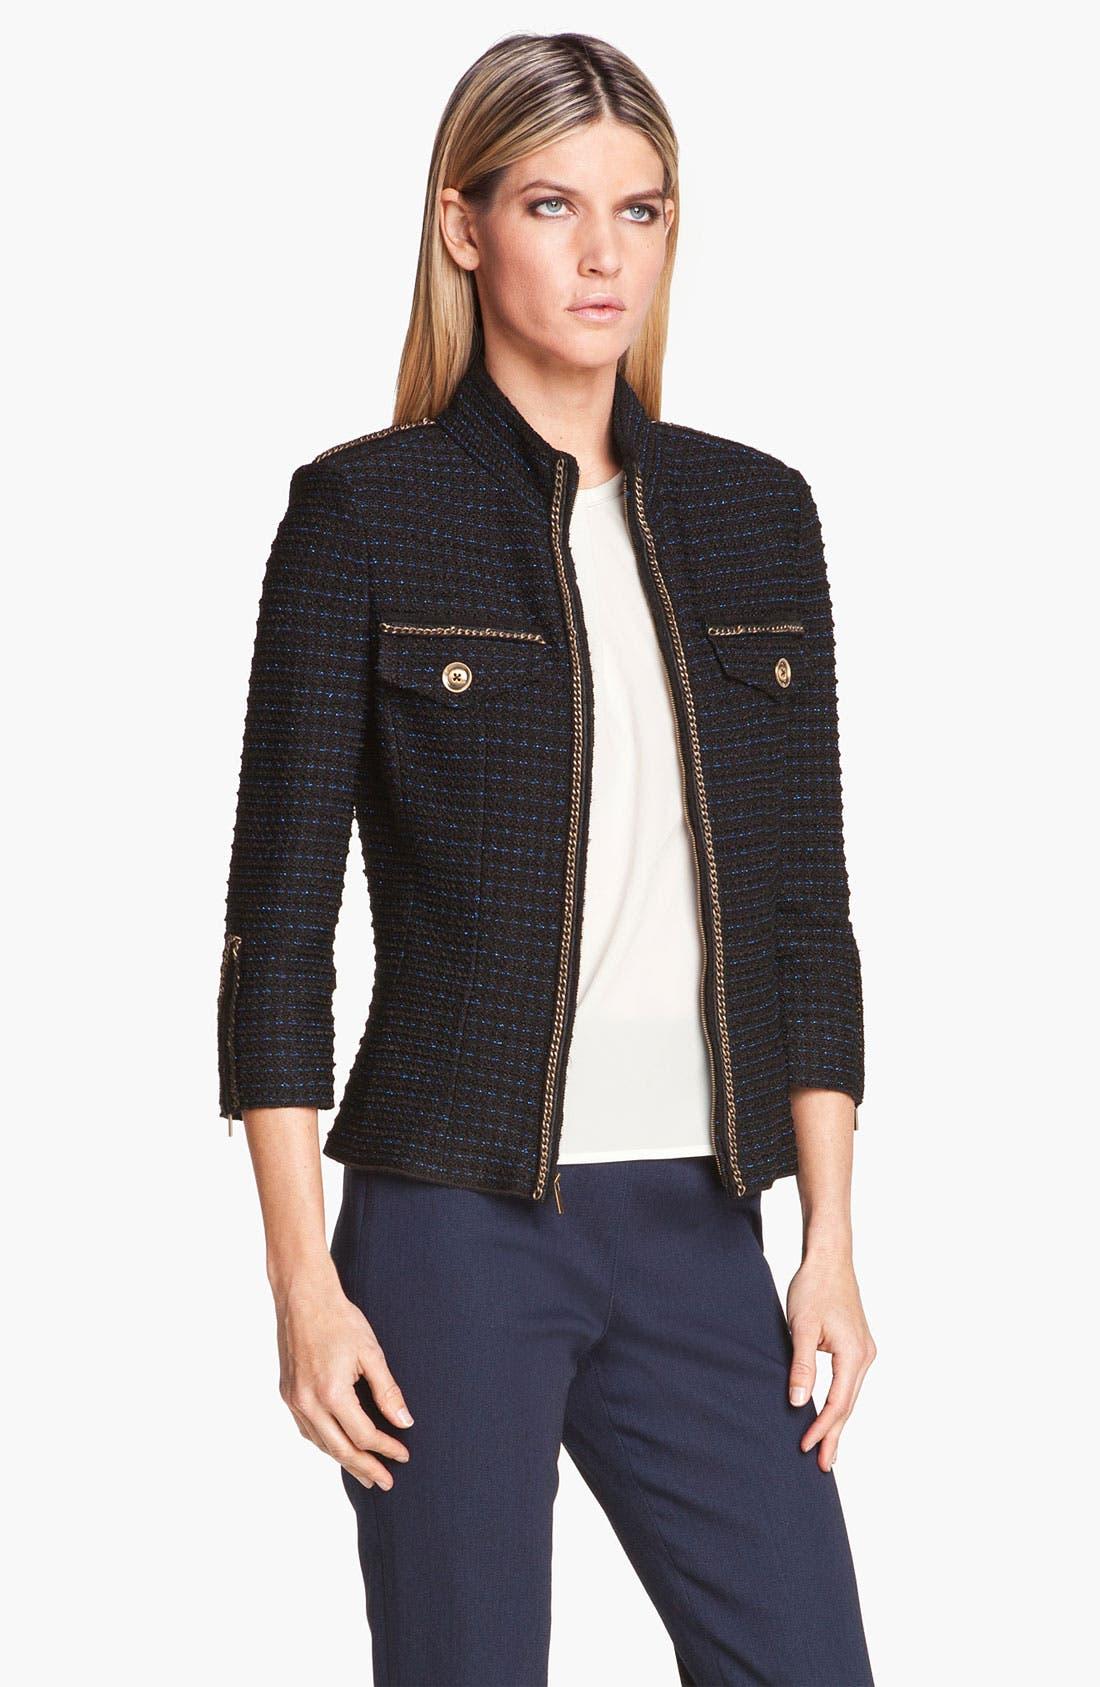 Main Image - St. John Collection Military Tweed Knit Jacket